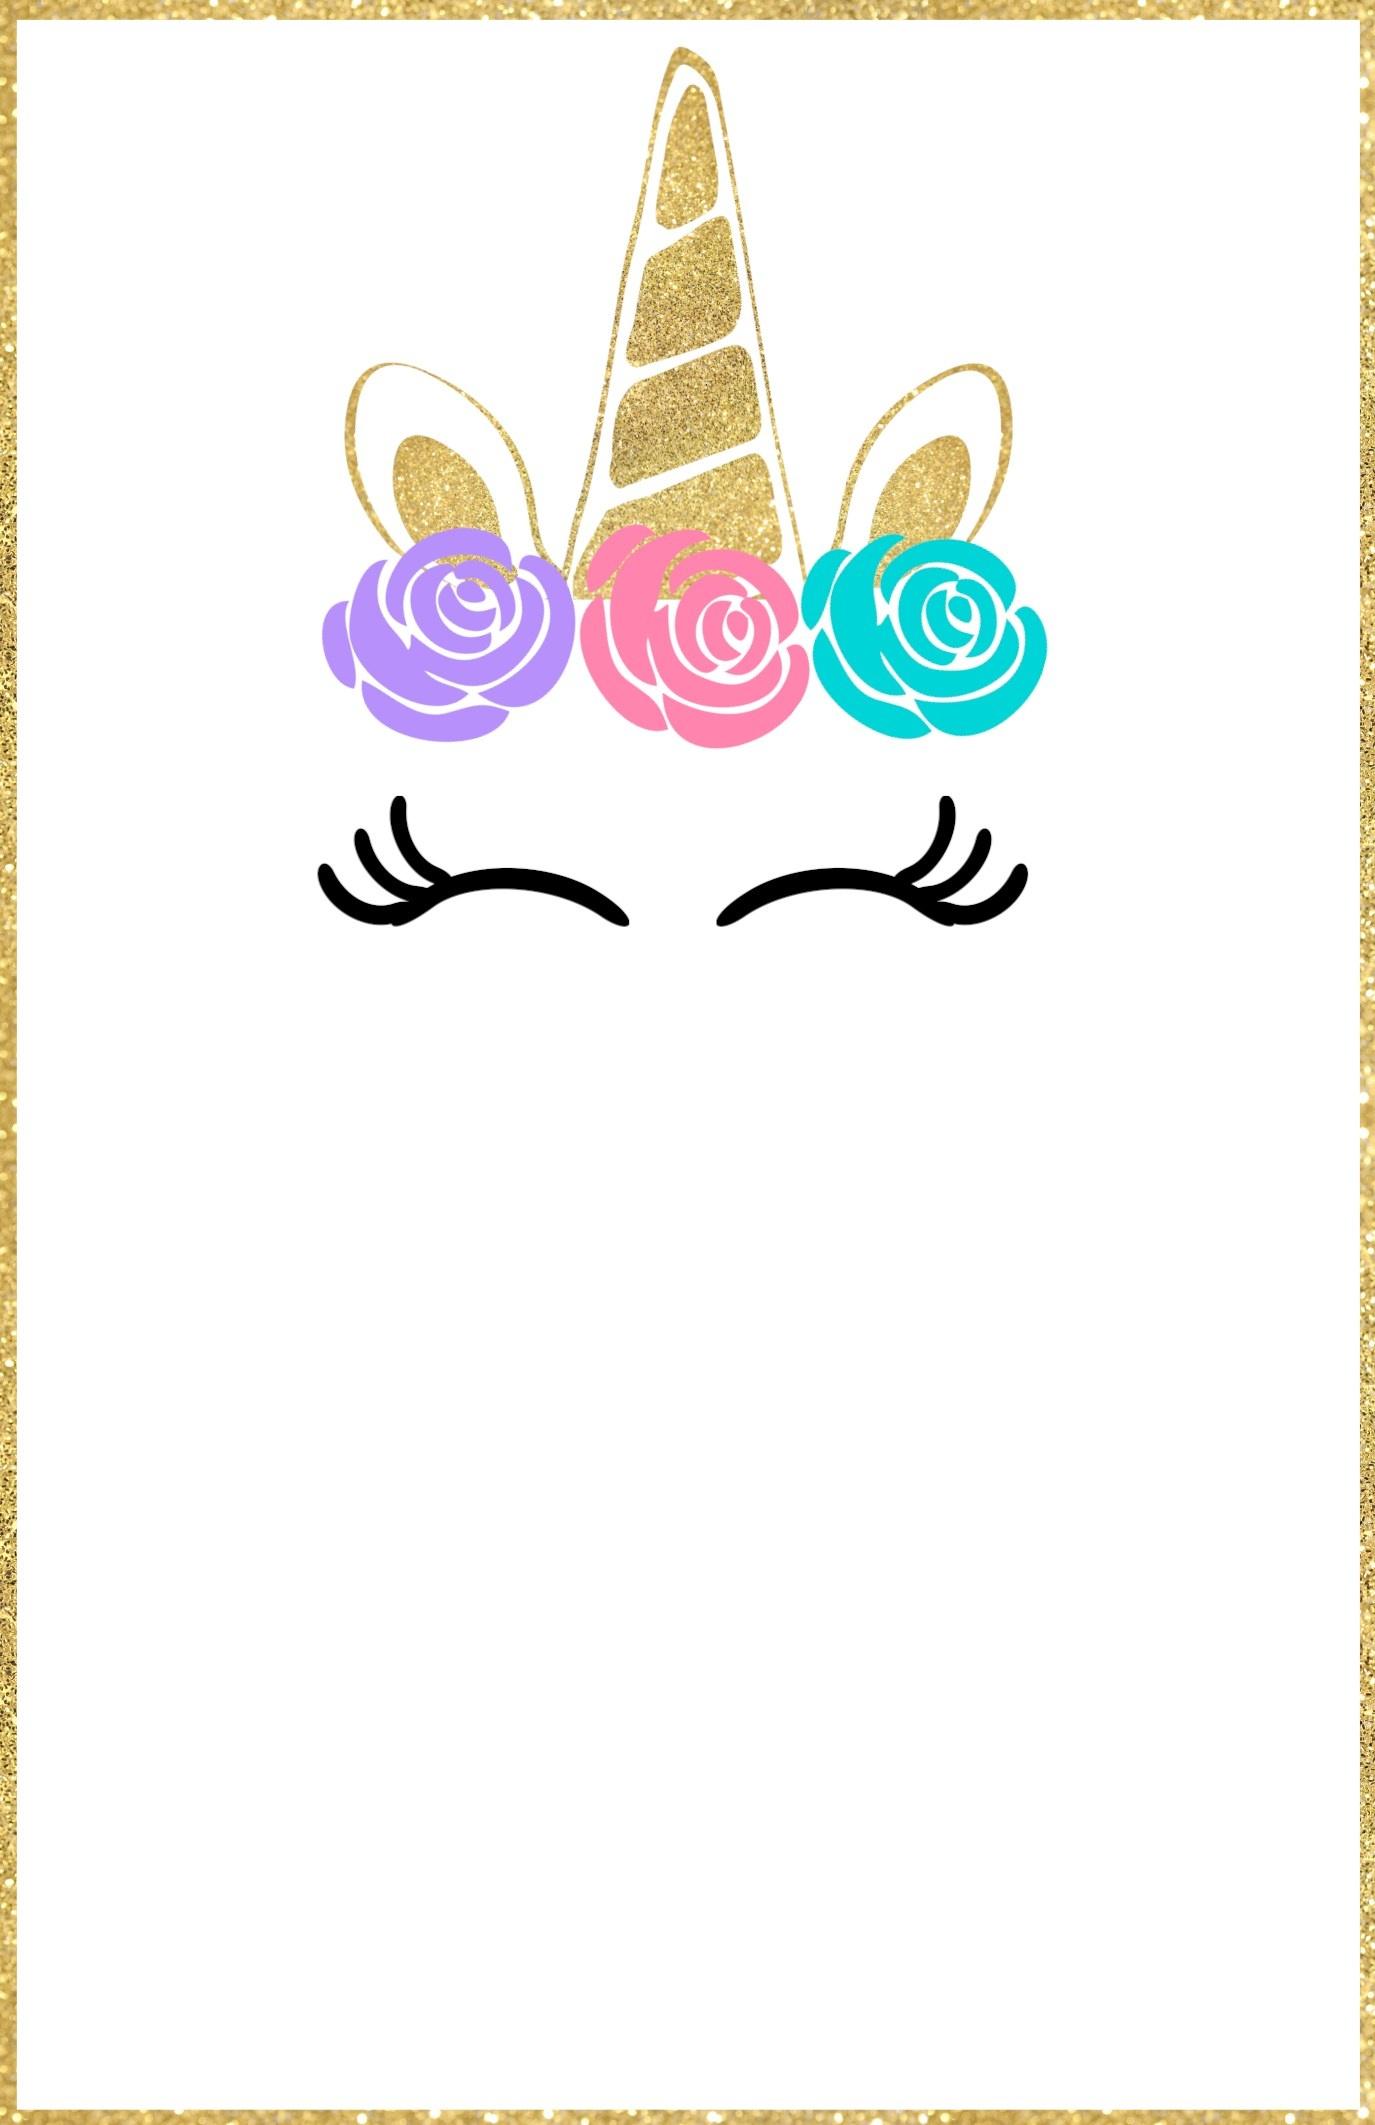 Free Printable Unicorn Invitations Template - Paper Trail Design - Free Printable Unicorn Invitations